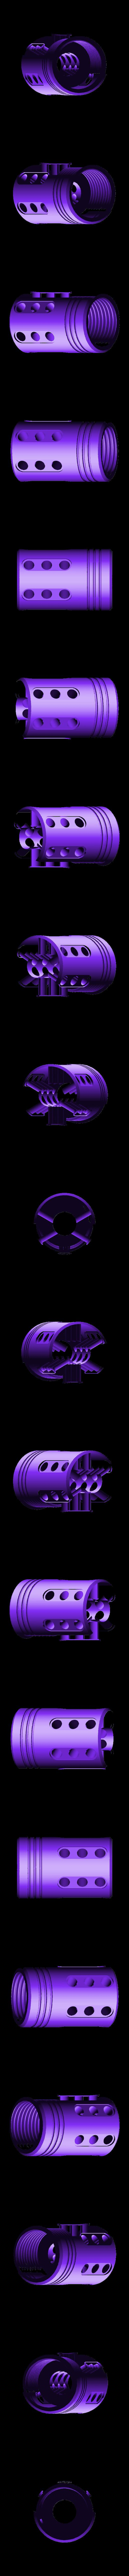 muzzle_brake.stl Download free STL file PISTOL VR magnetic gunstock Oculus Rift-S Quest • 3D printer template, danielschweinert